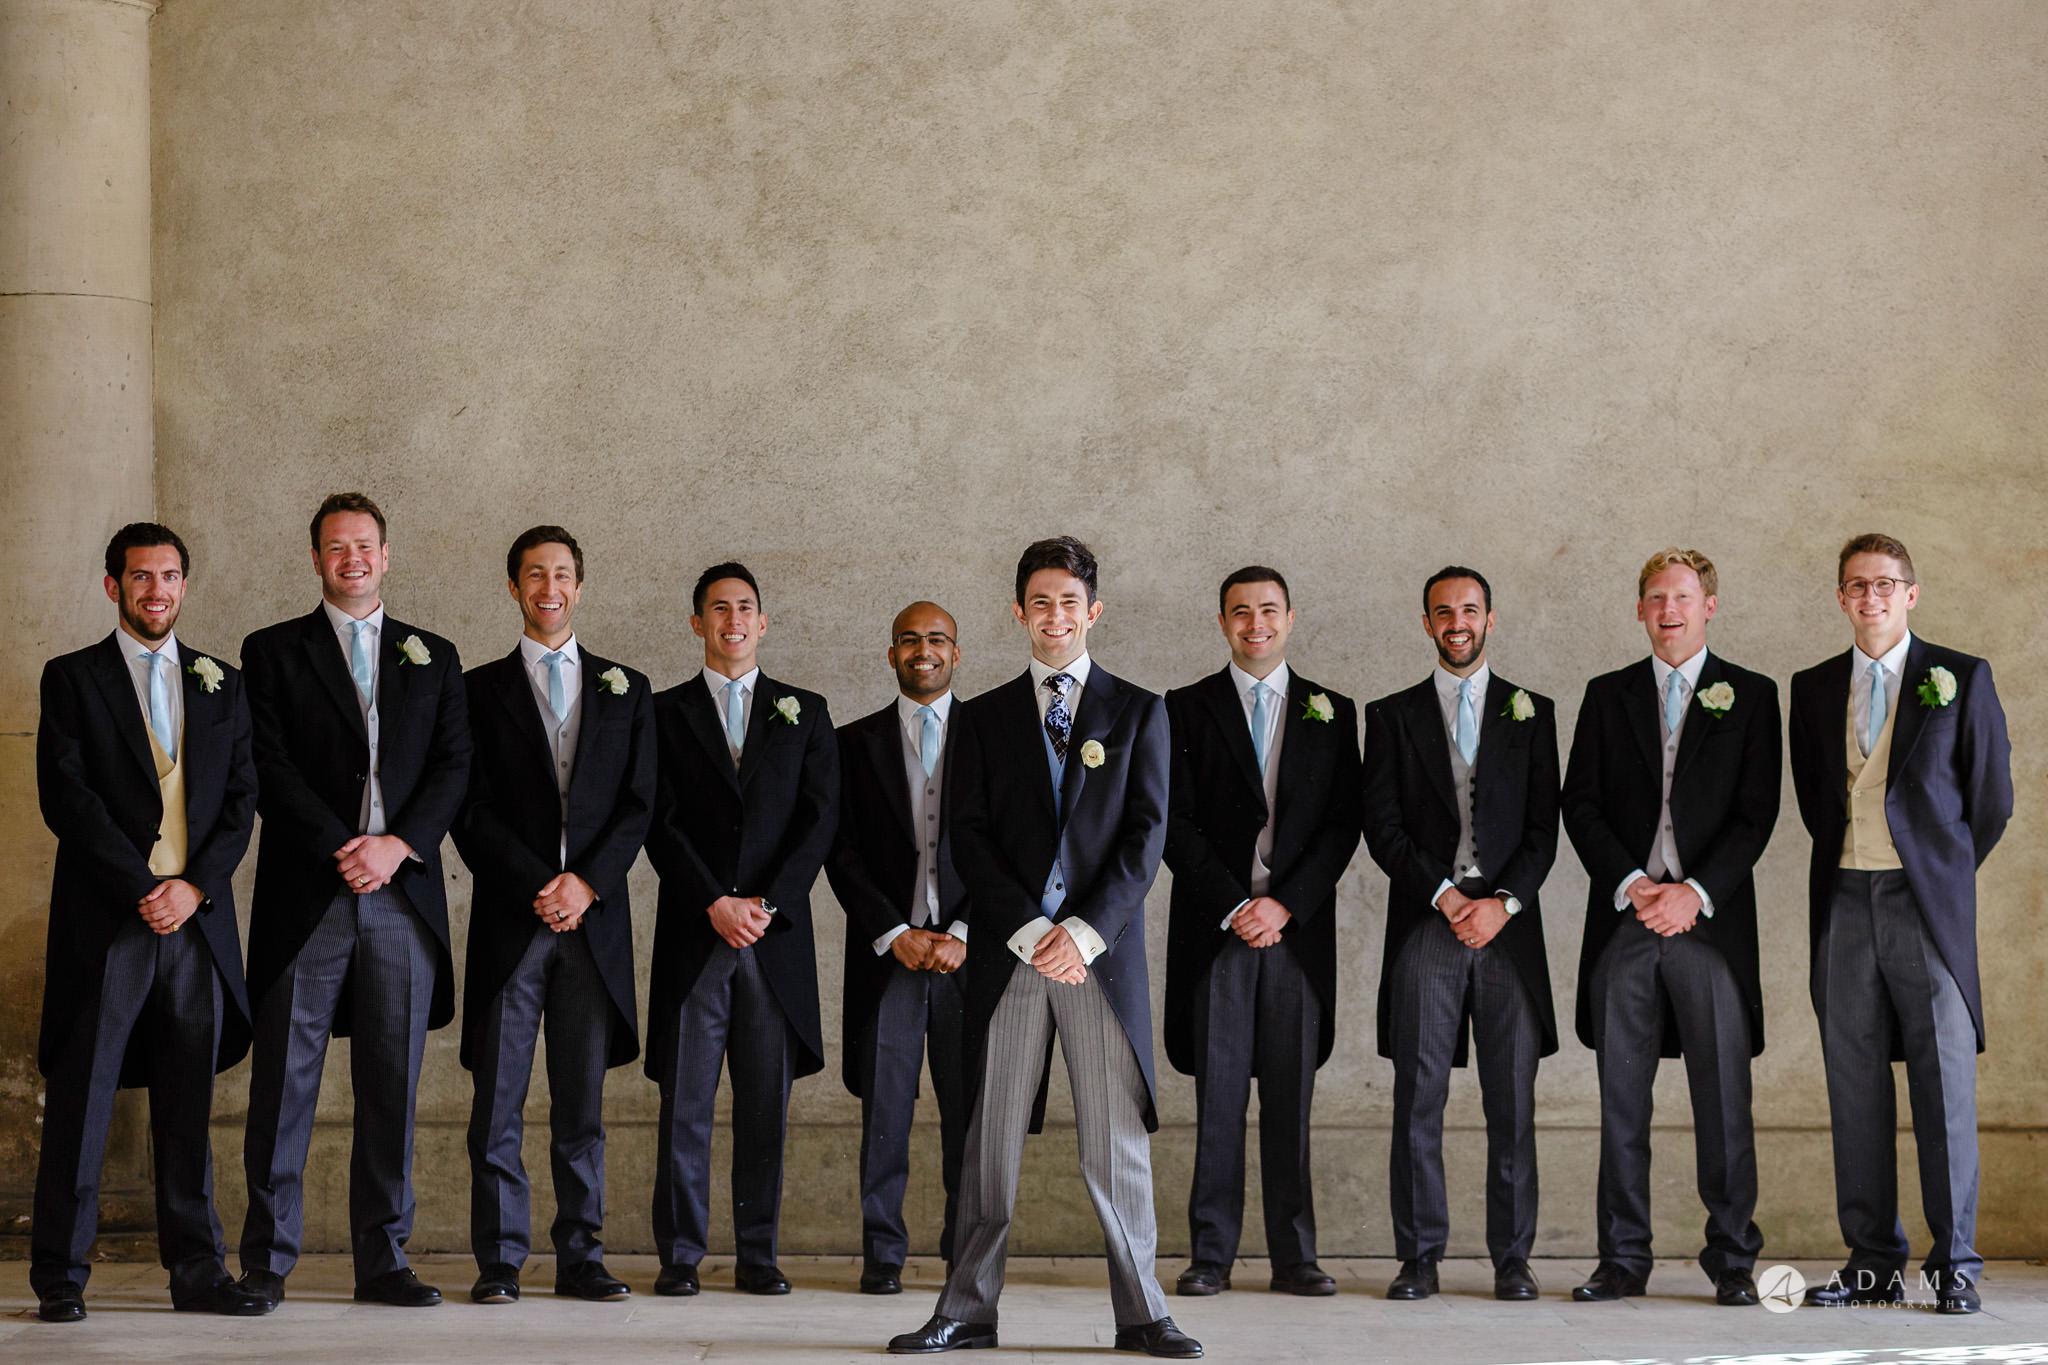 Trinity College Cambridge wedding groom and groomsmen group photo